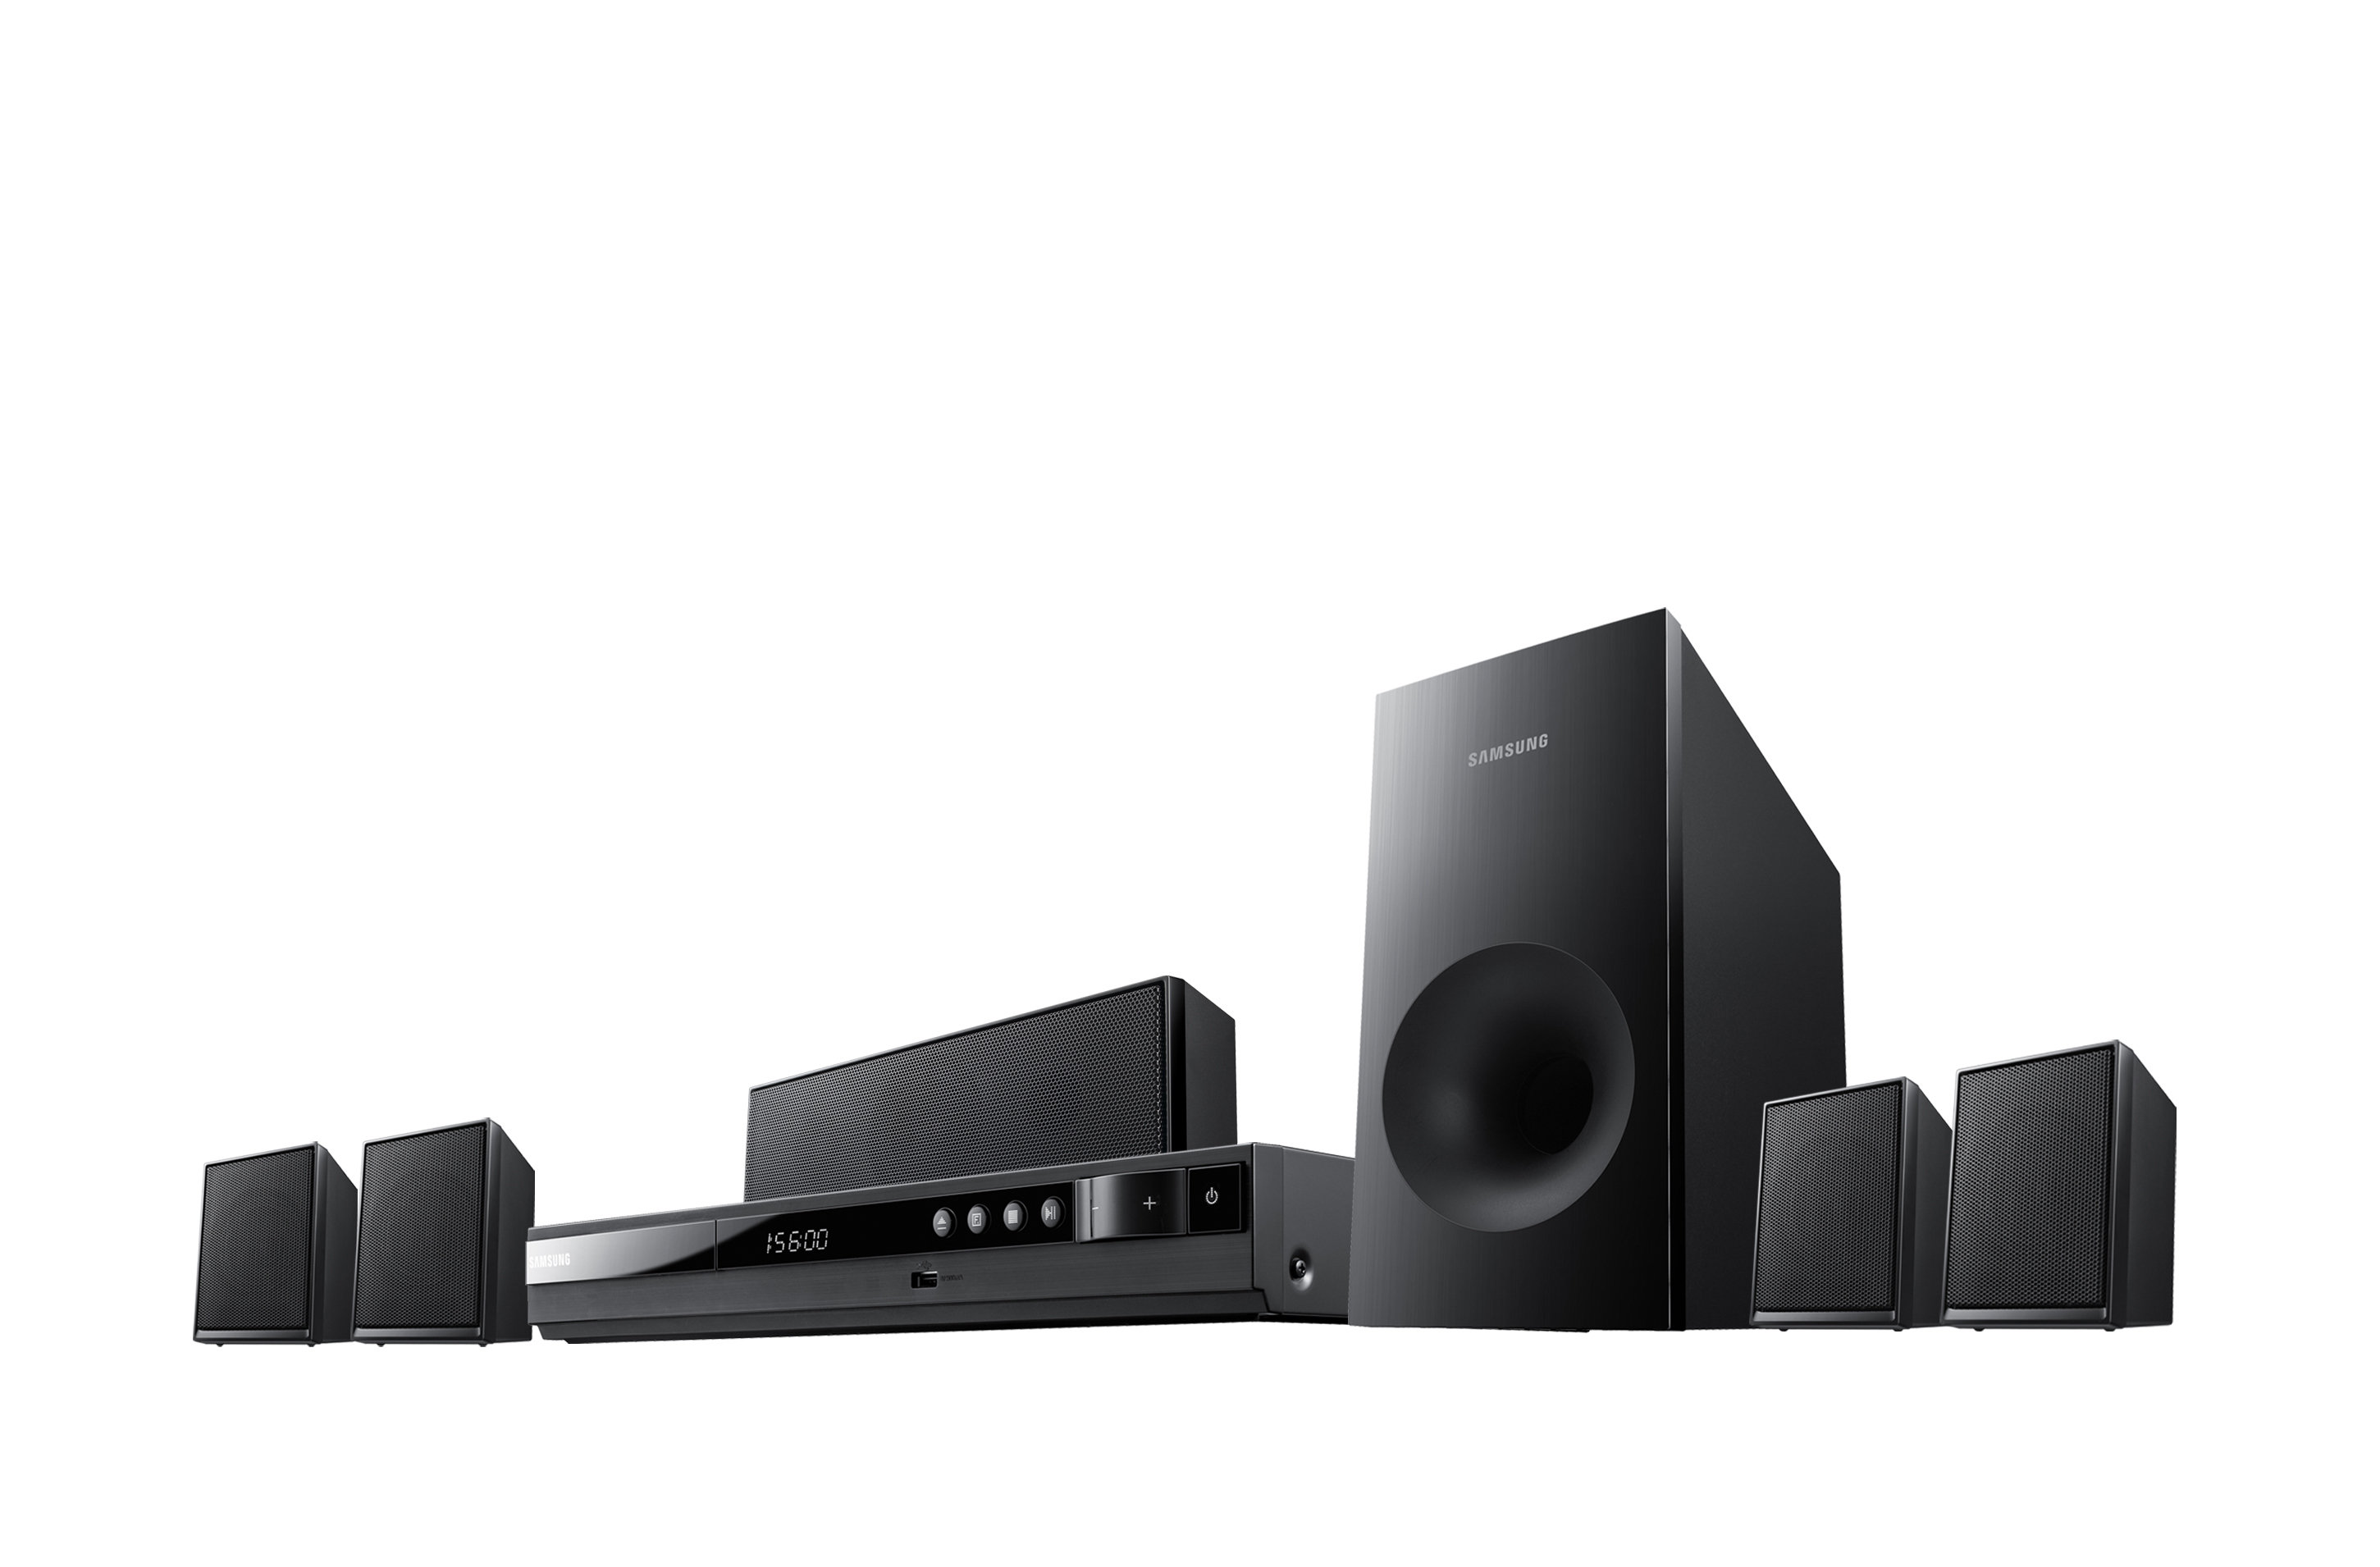 Amazon Samsung HT E HTIB 51 Channel Watt Home Theater